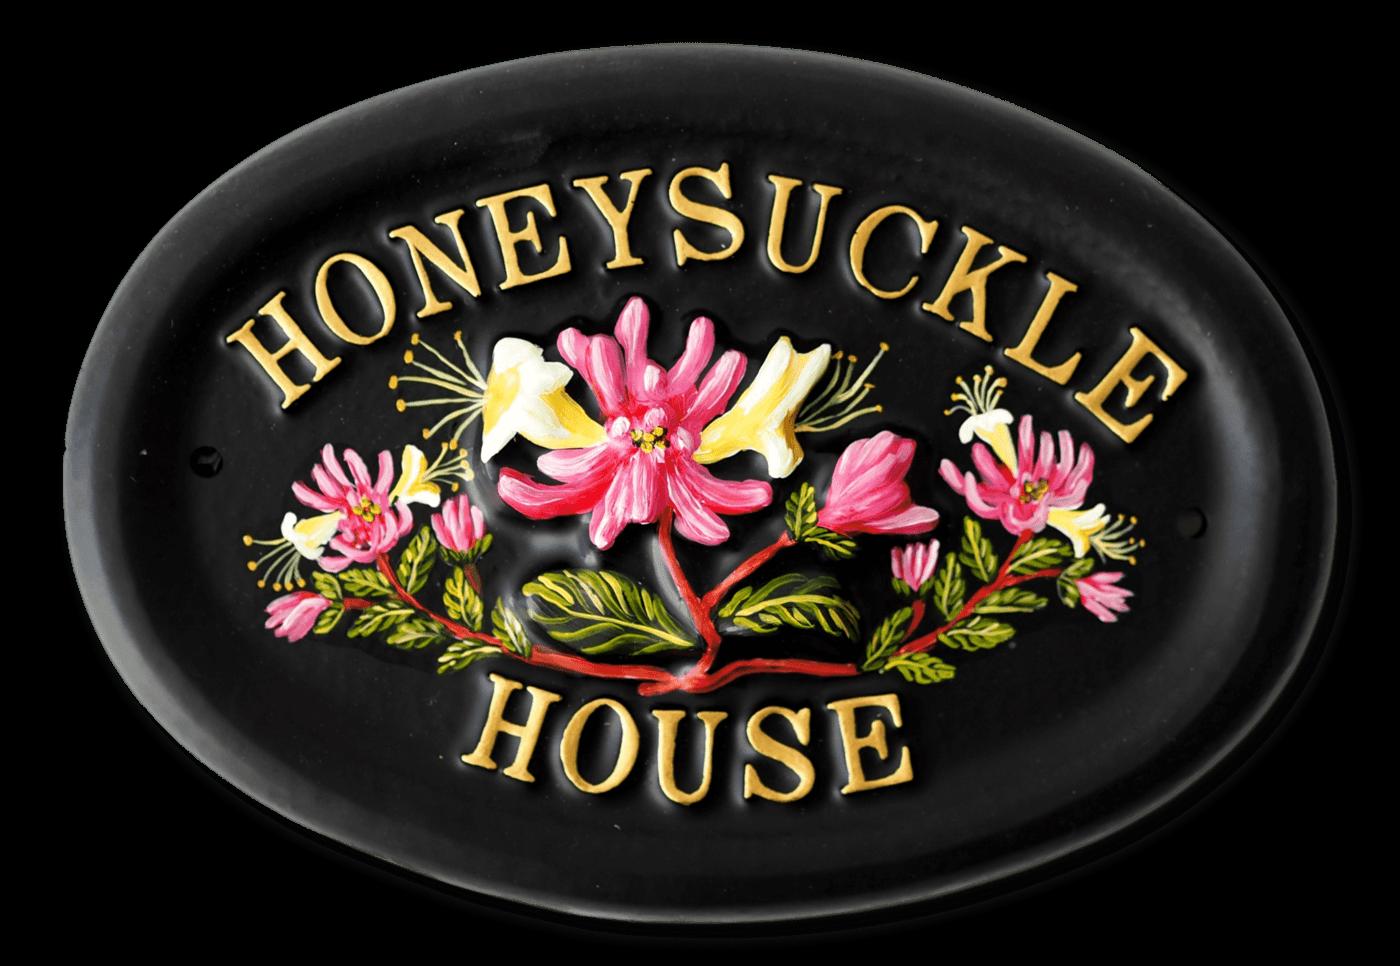 Honeysuckle house sign